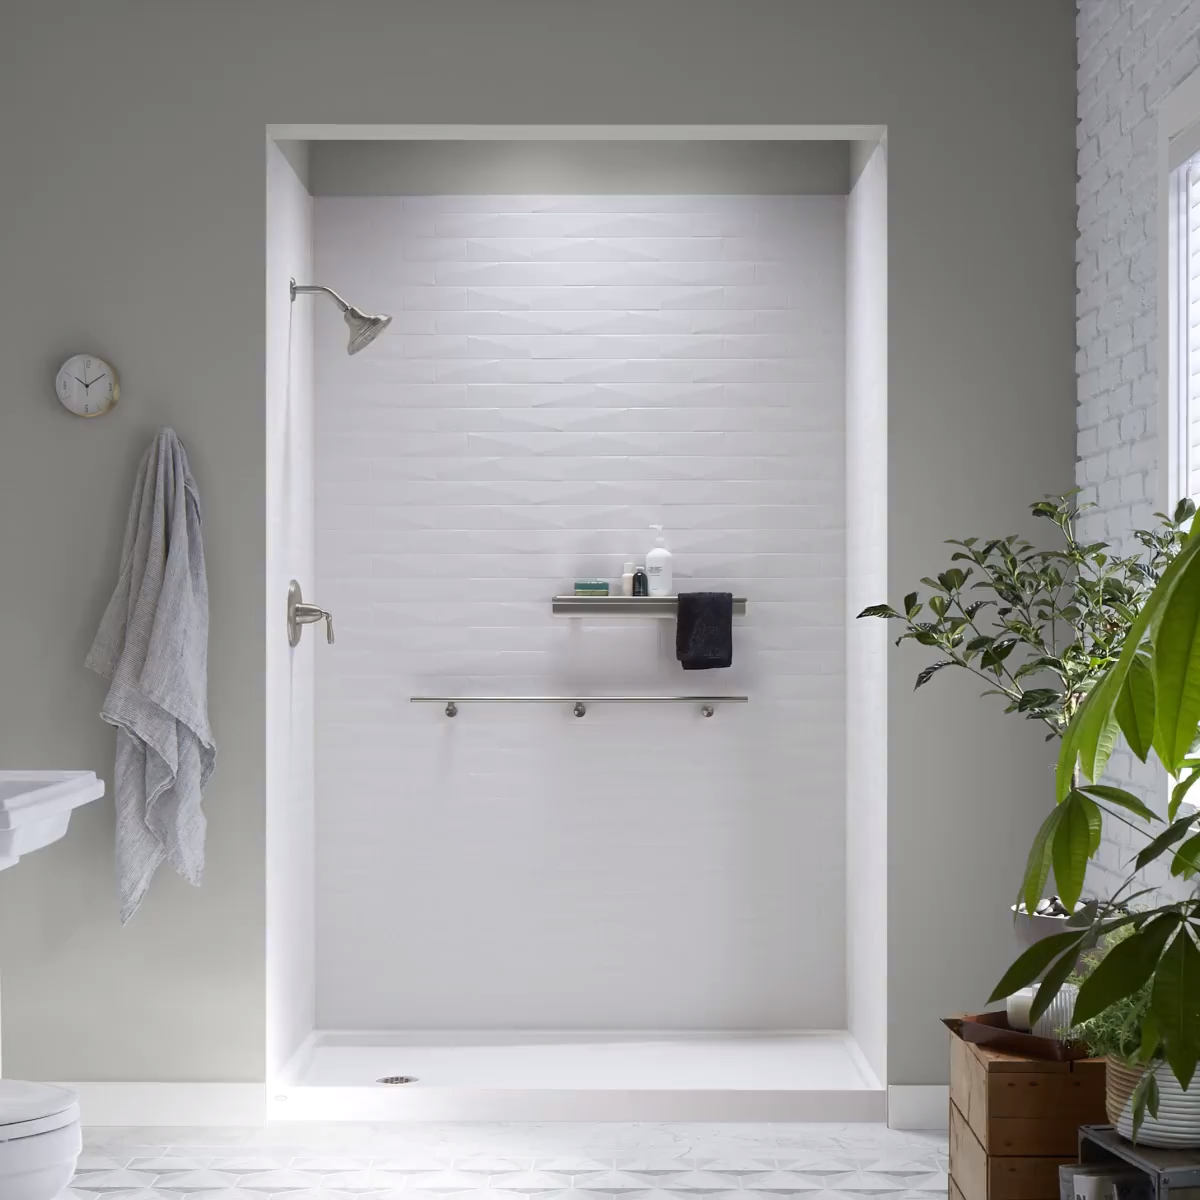 Kohler Luxstone Shower Replacements By Home Smart Industries Pennsylvania Nj De Md Video Bathroom Shower Systems Kohler Shower Kohler